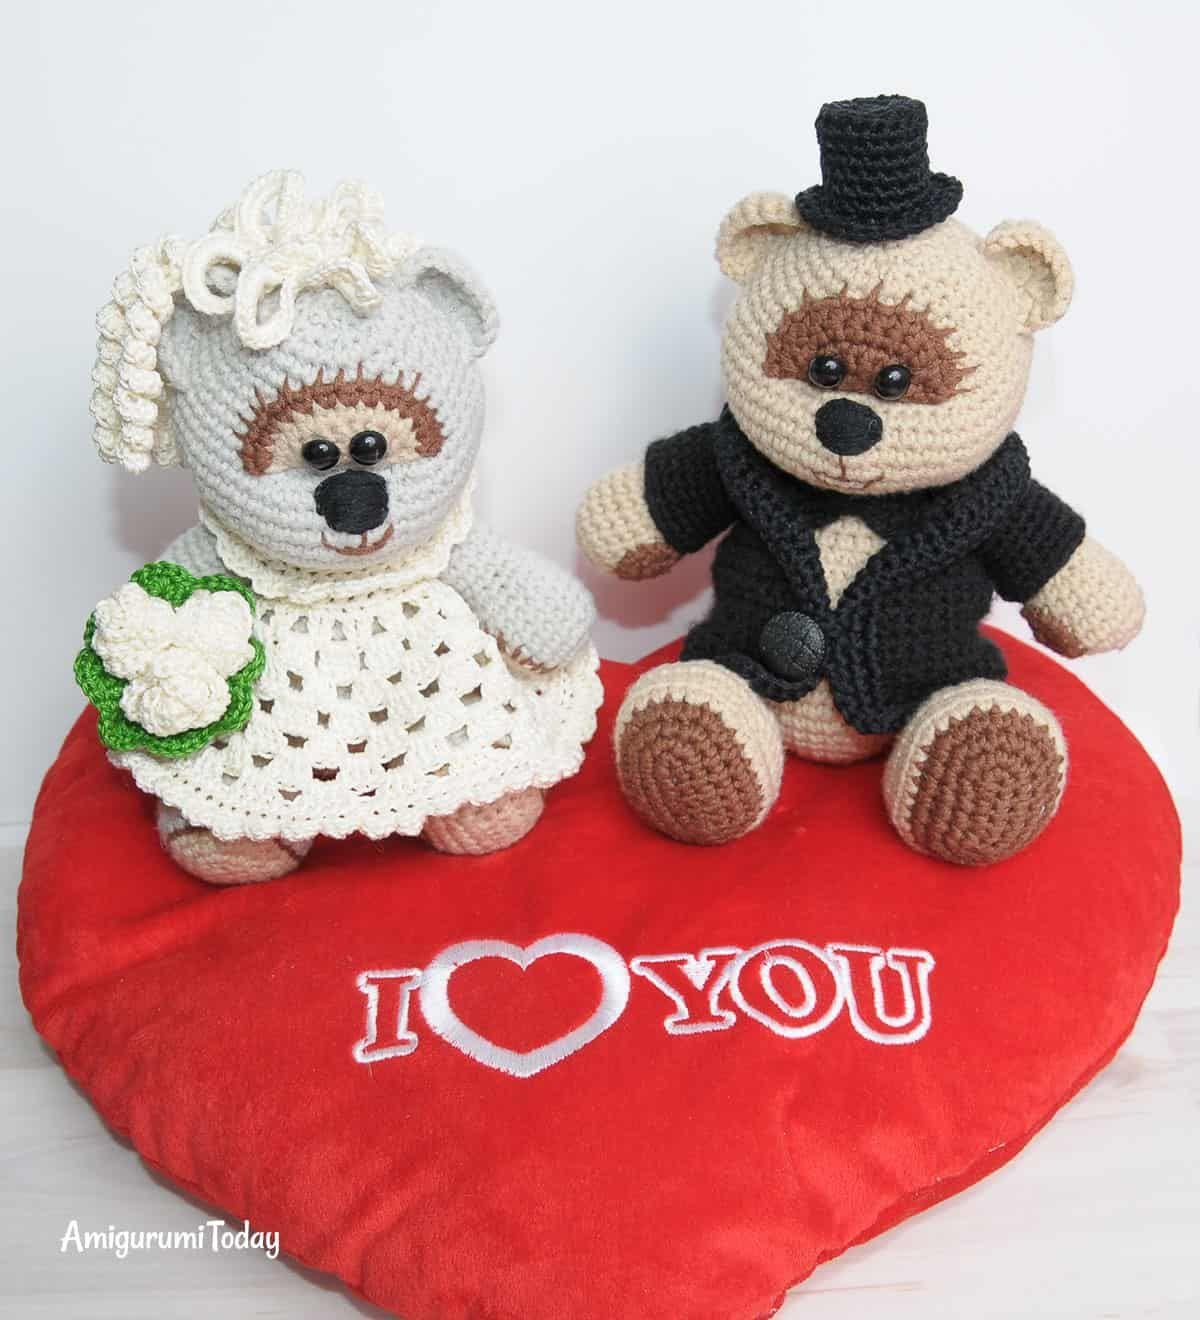 Ositos de boda Amigurumi: patrón de ganchillo | Uni-2 | Pinterest ...